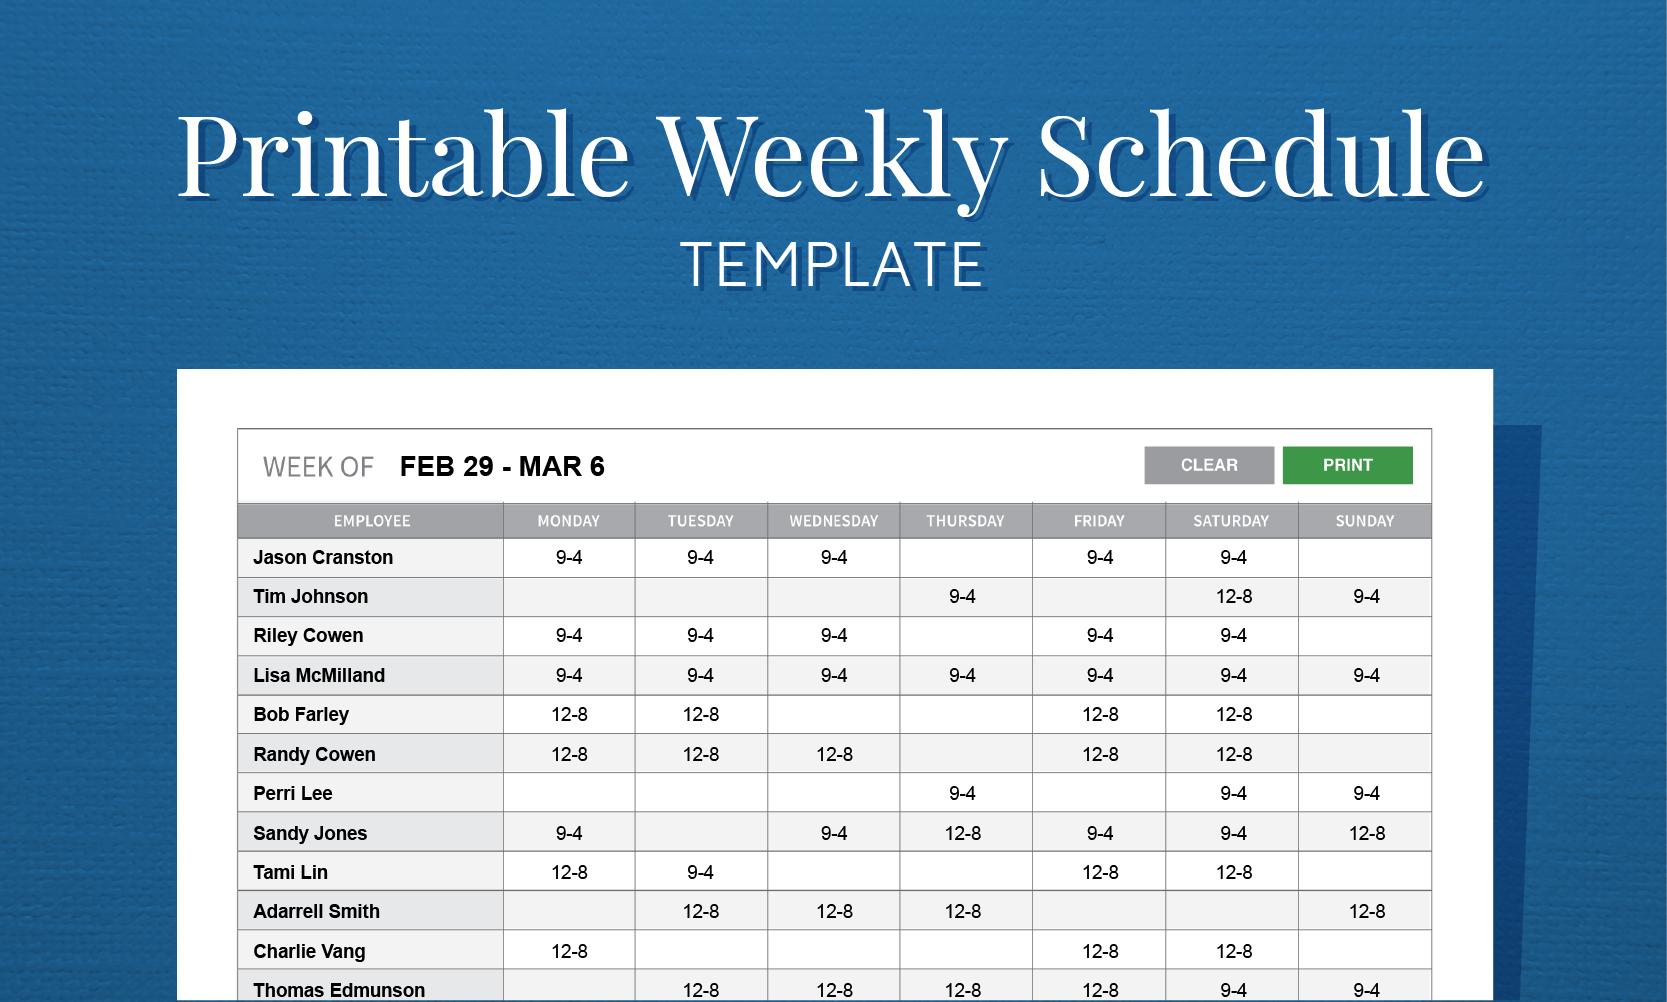 Free Printable Weekly Work Schedule Template For Employee Scheduling - Free Printable Monthly Work Schedule Template